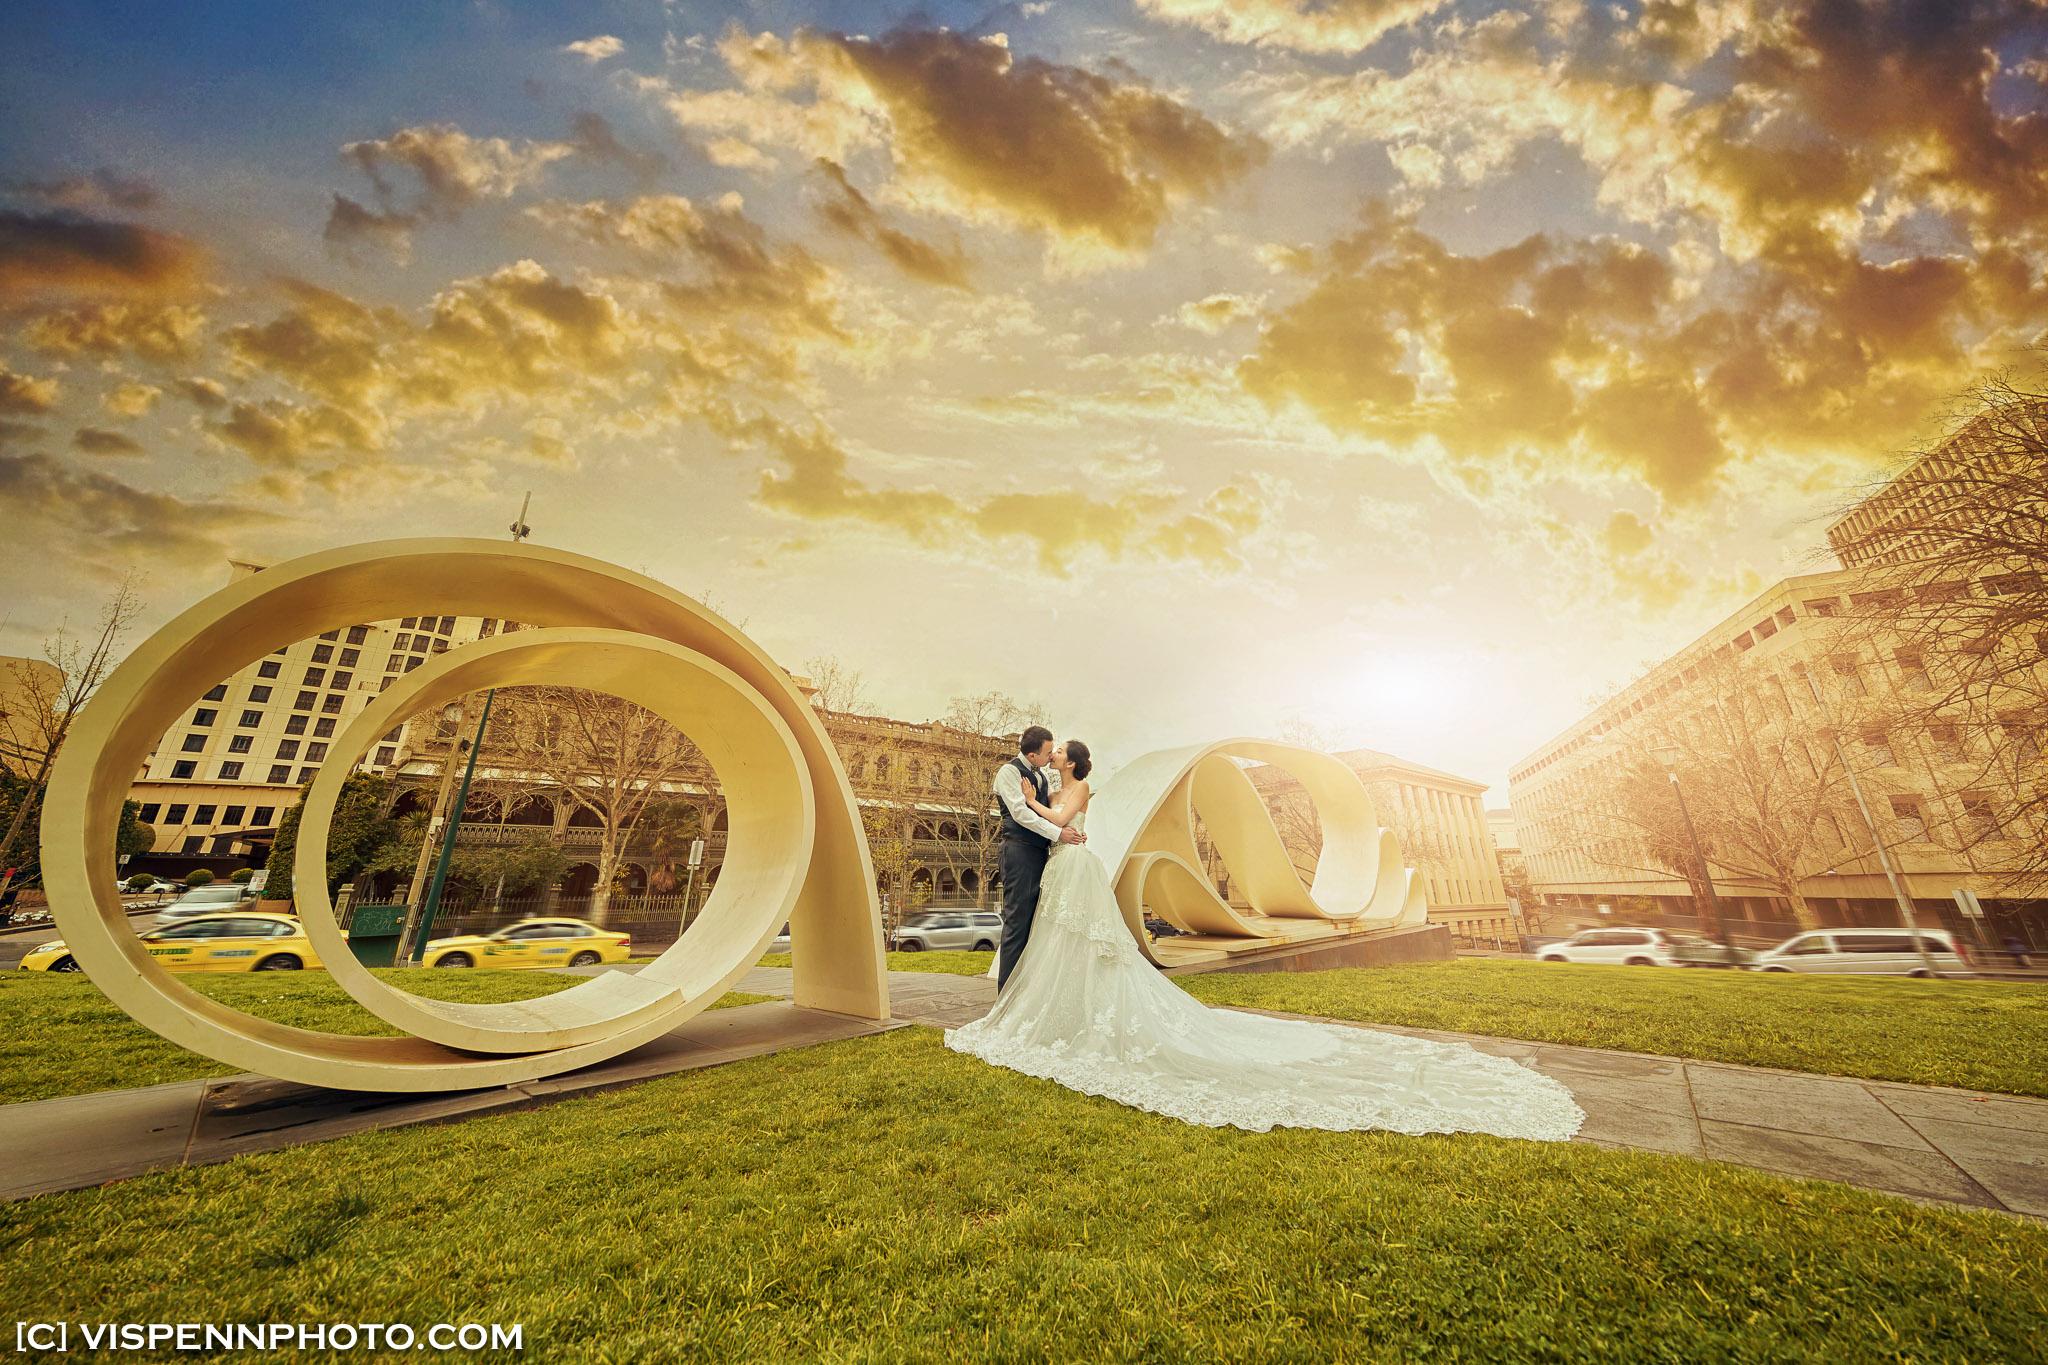 PRE WEDDING Photography Melbourne VISPENN 墨尔本 婚纱照 结婚照 婚纱摄影 VISPENN XXD 2488 1